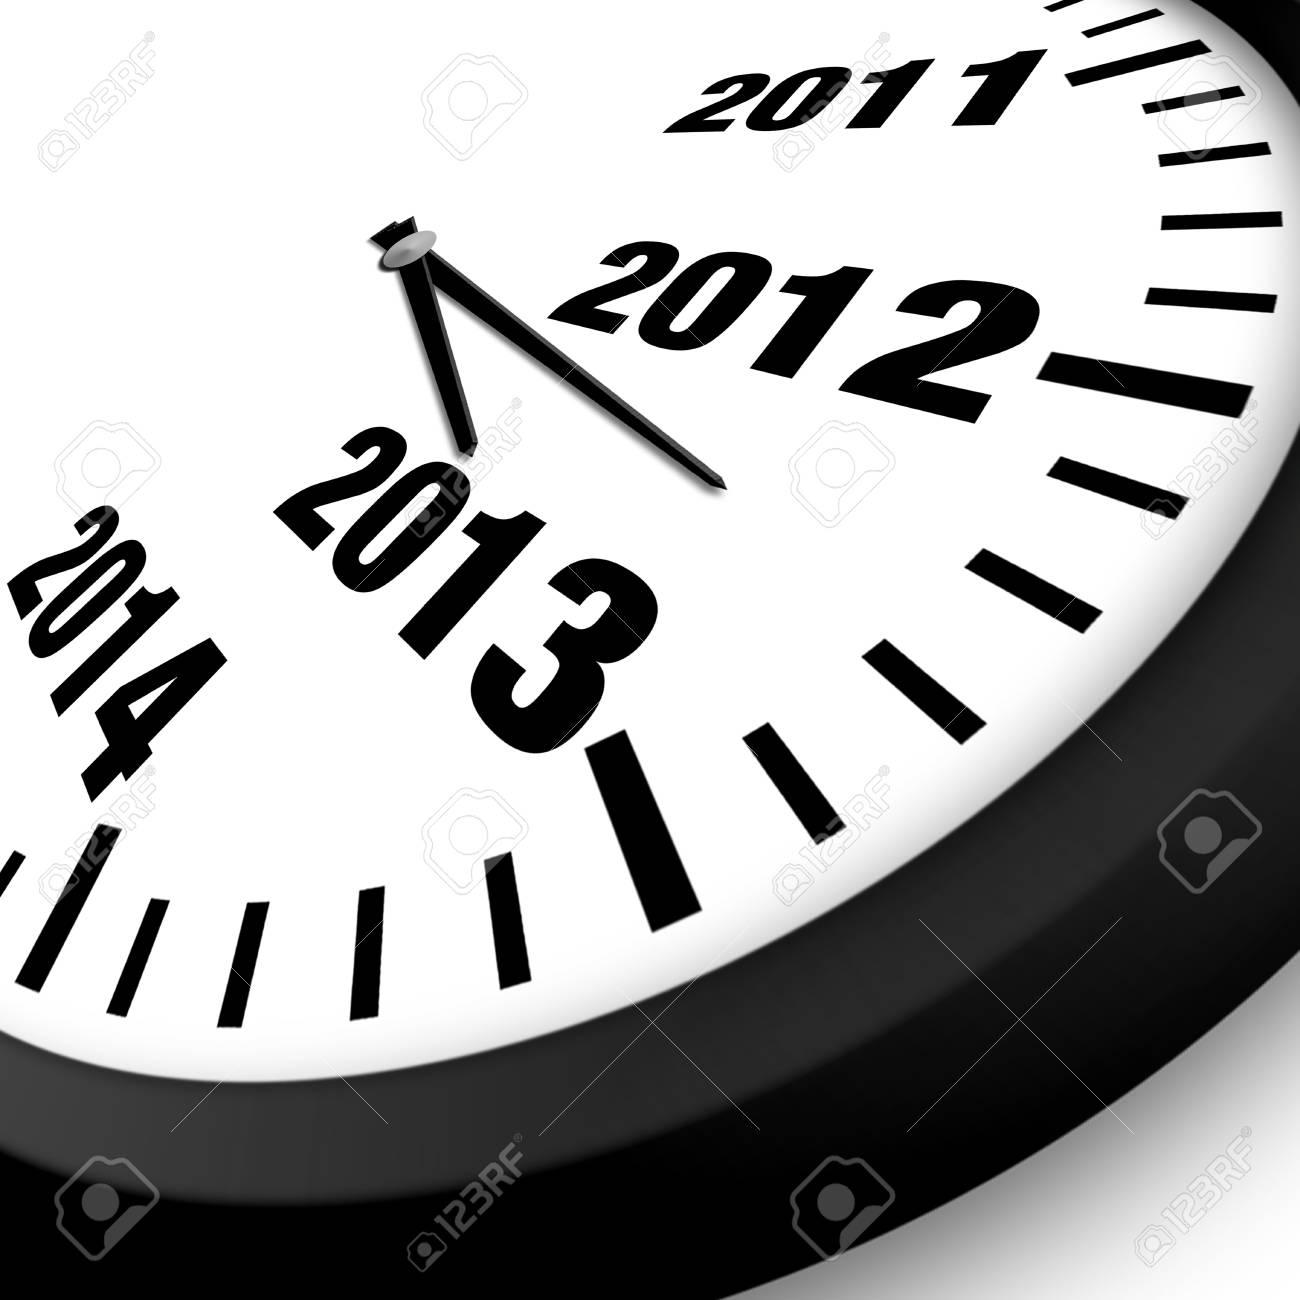 2013 New Year clock Stock Photo - 15119988